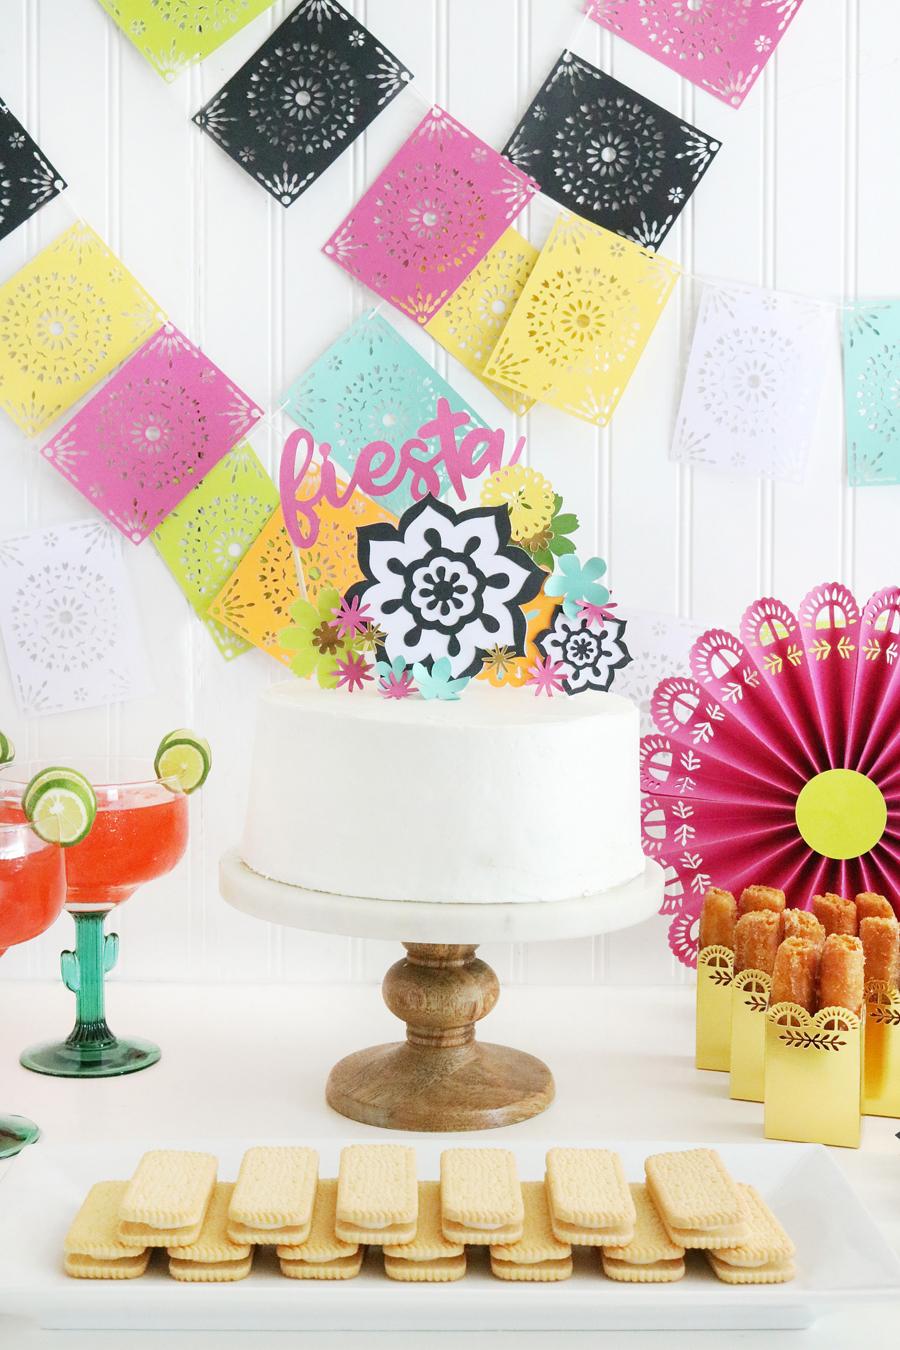 Easy DIY Fiesta Inspired Cake Toppers & Treat Bags